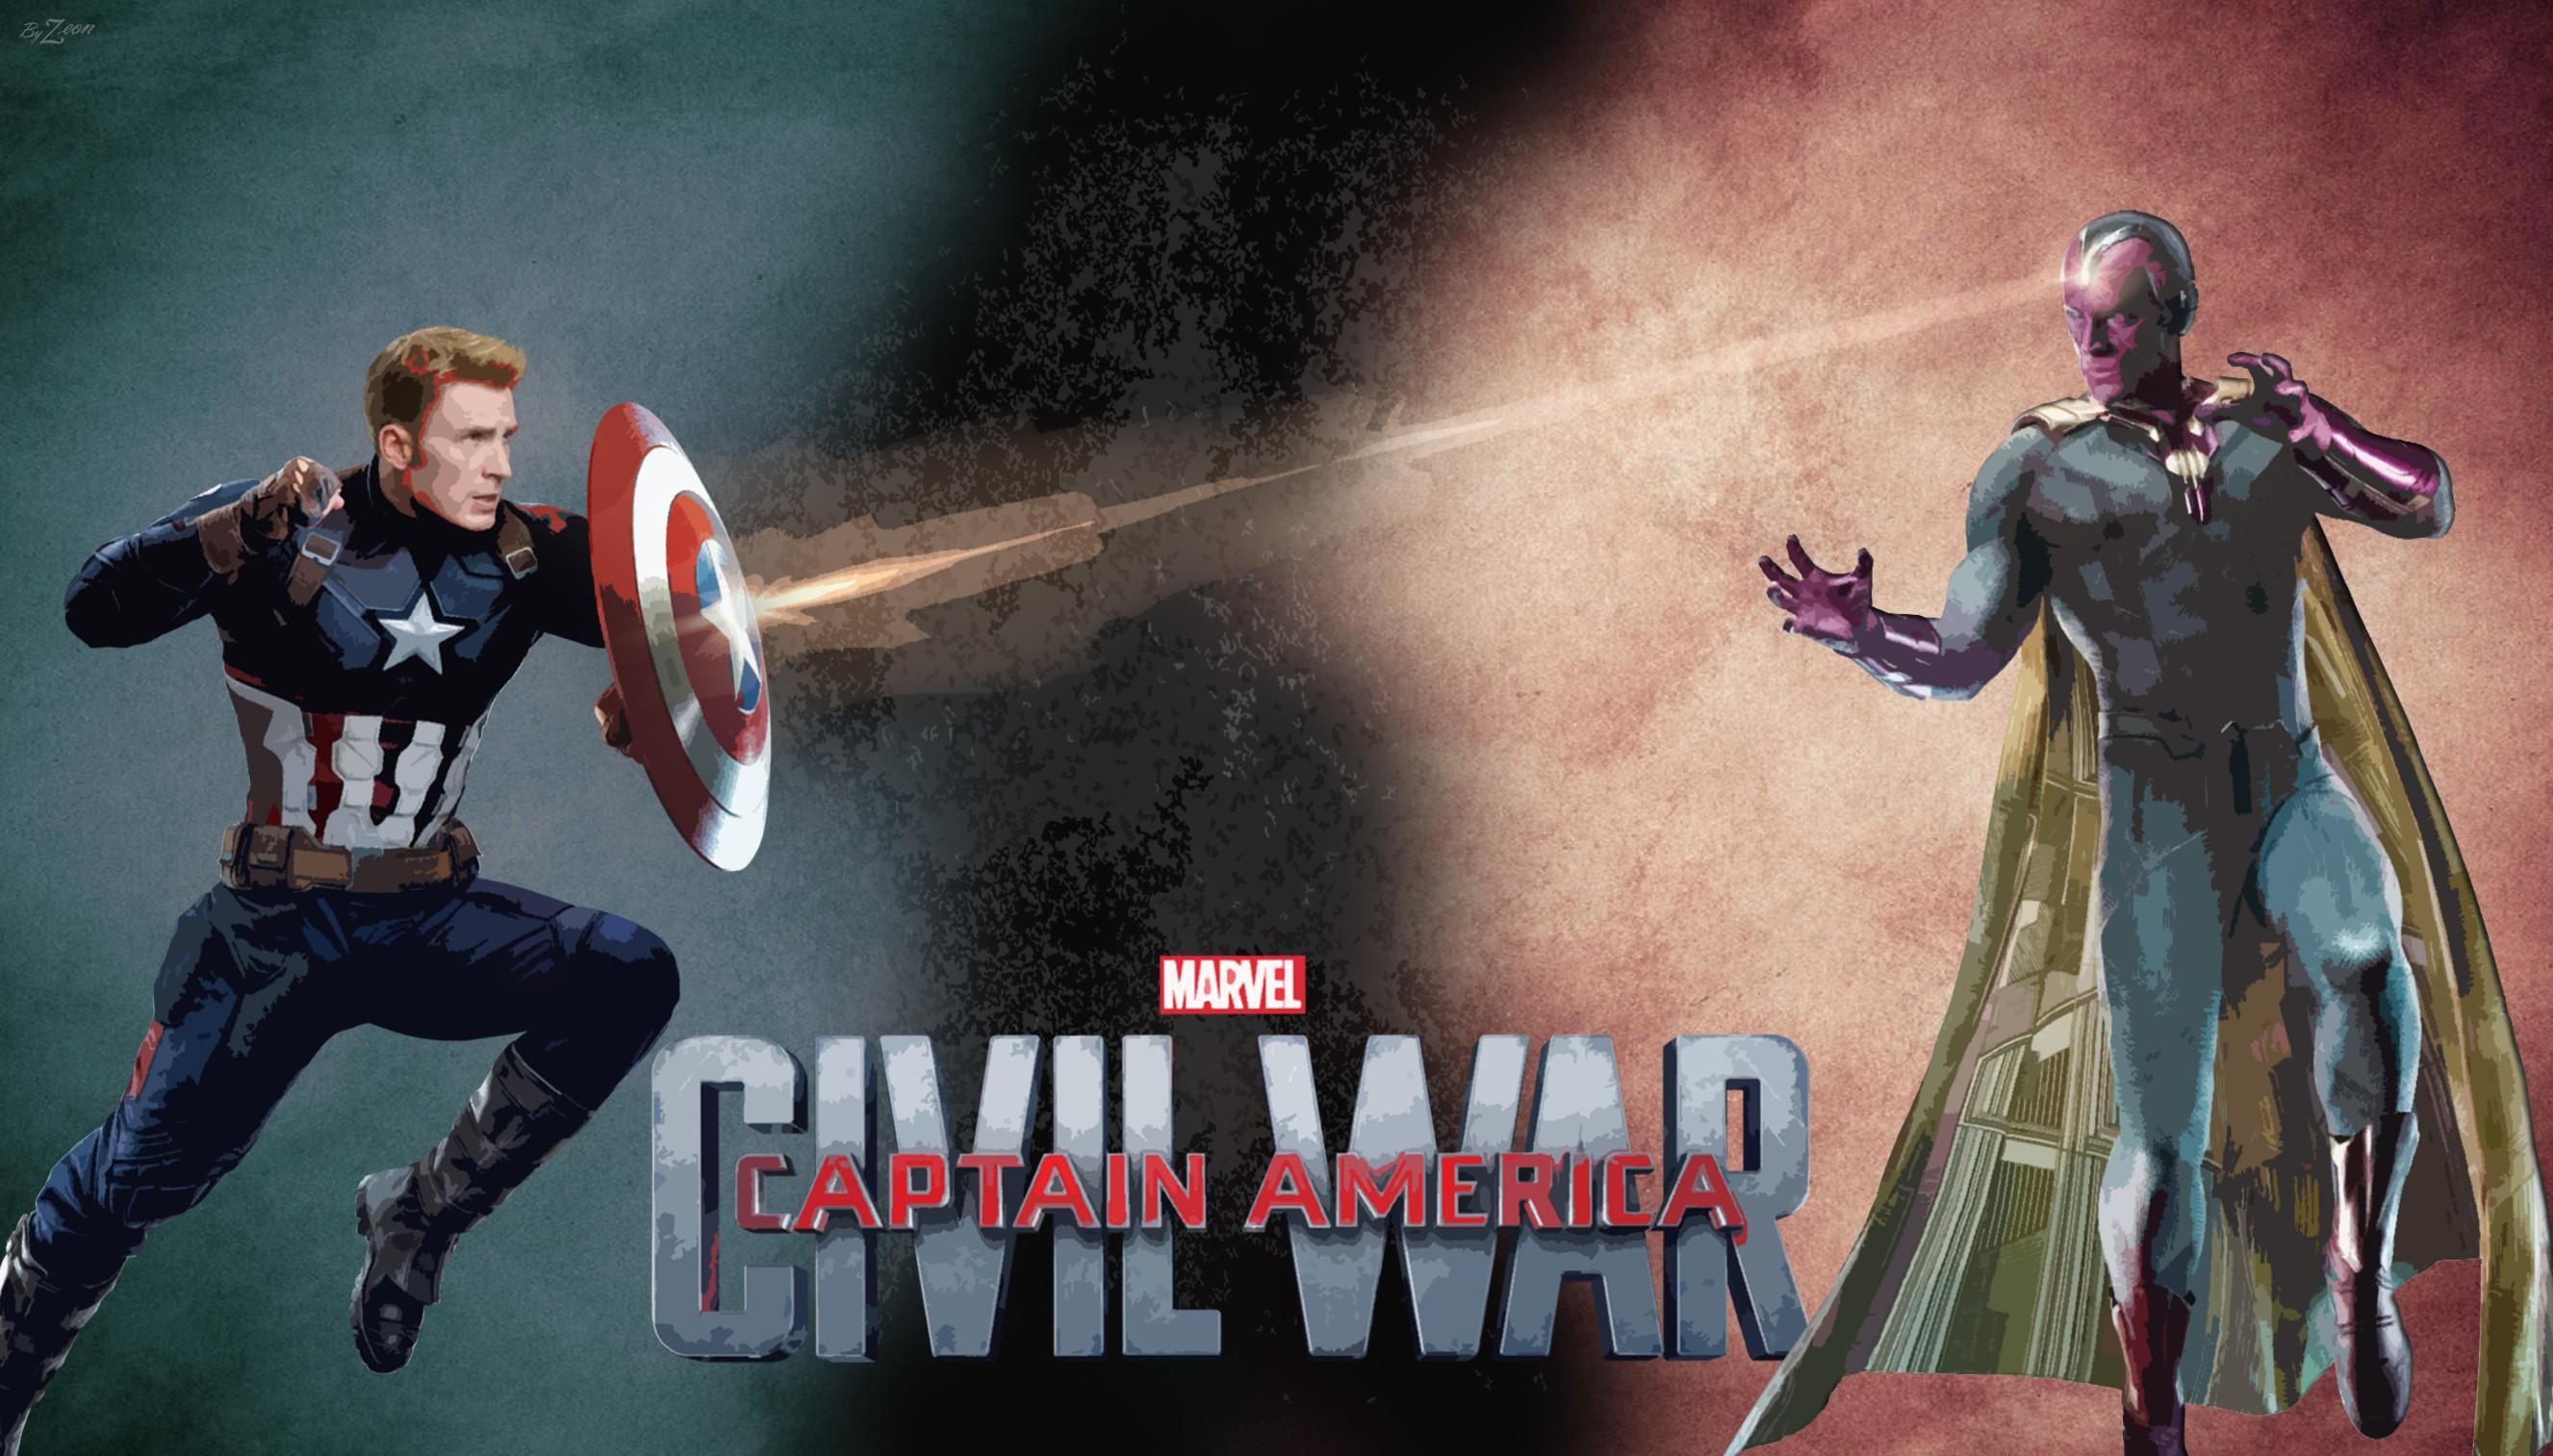 Good Wallpaper Movie Captain America Civil War - superhero-Marvel-Comics-Captain-America-Captain-America-Civil-War-The-Vision-Civil-War-comics-screenshot-54440  Best Photo Reference_776291.jpg